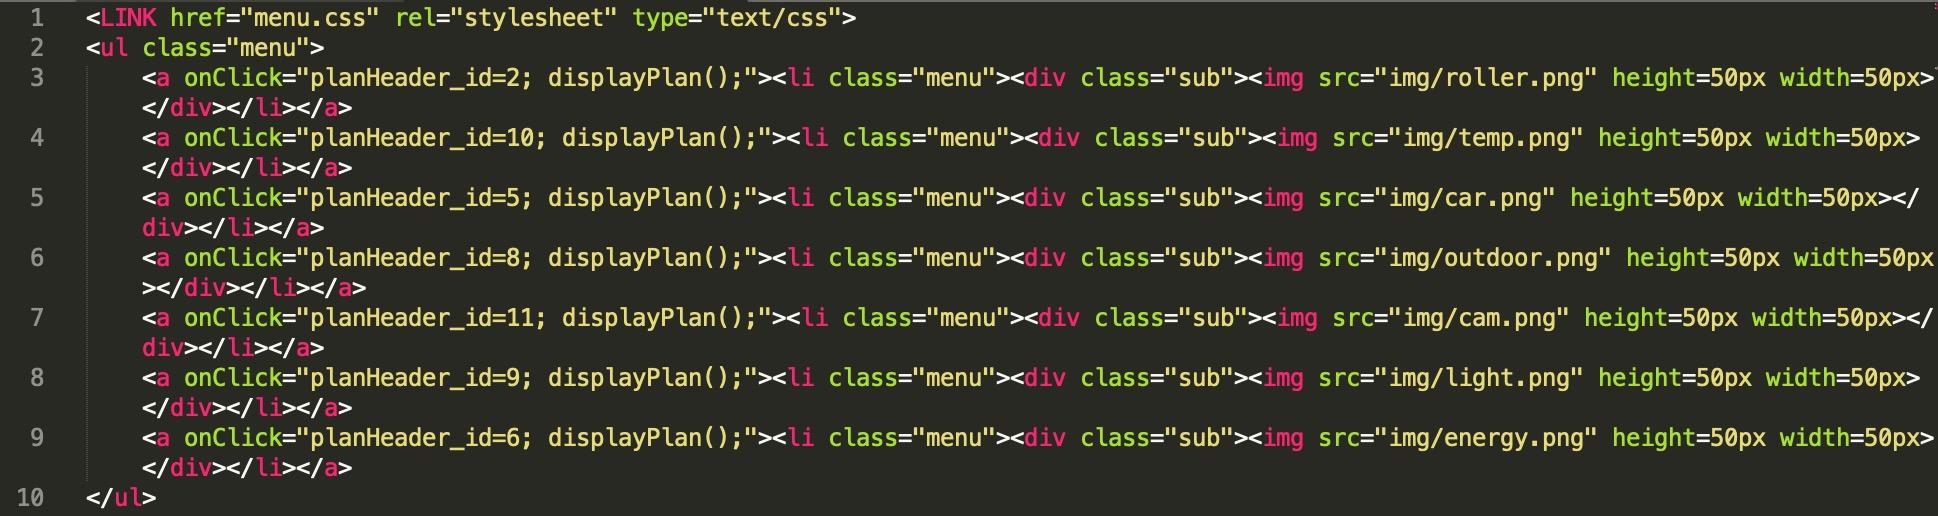 code-menu-jeedom-design